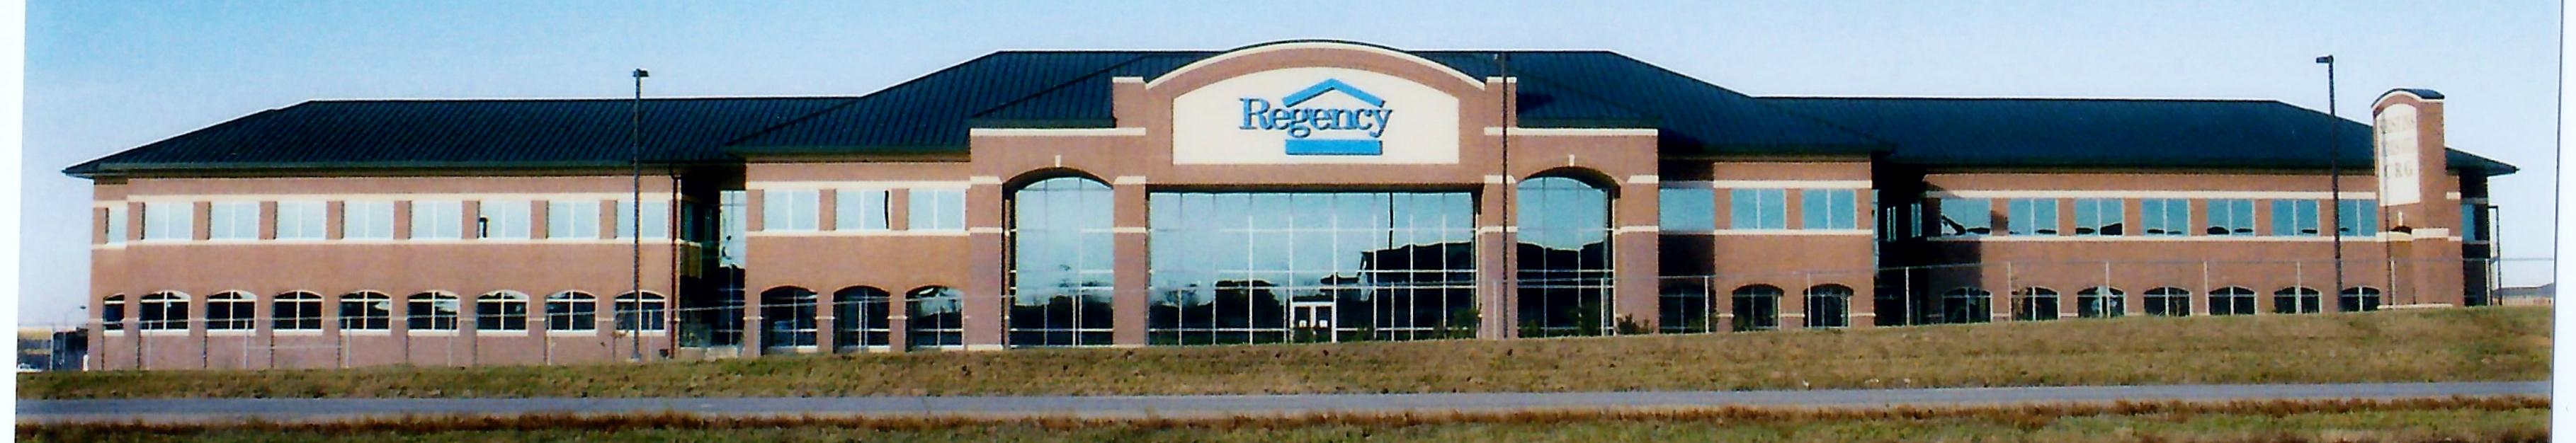 Regency Building